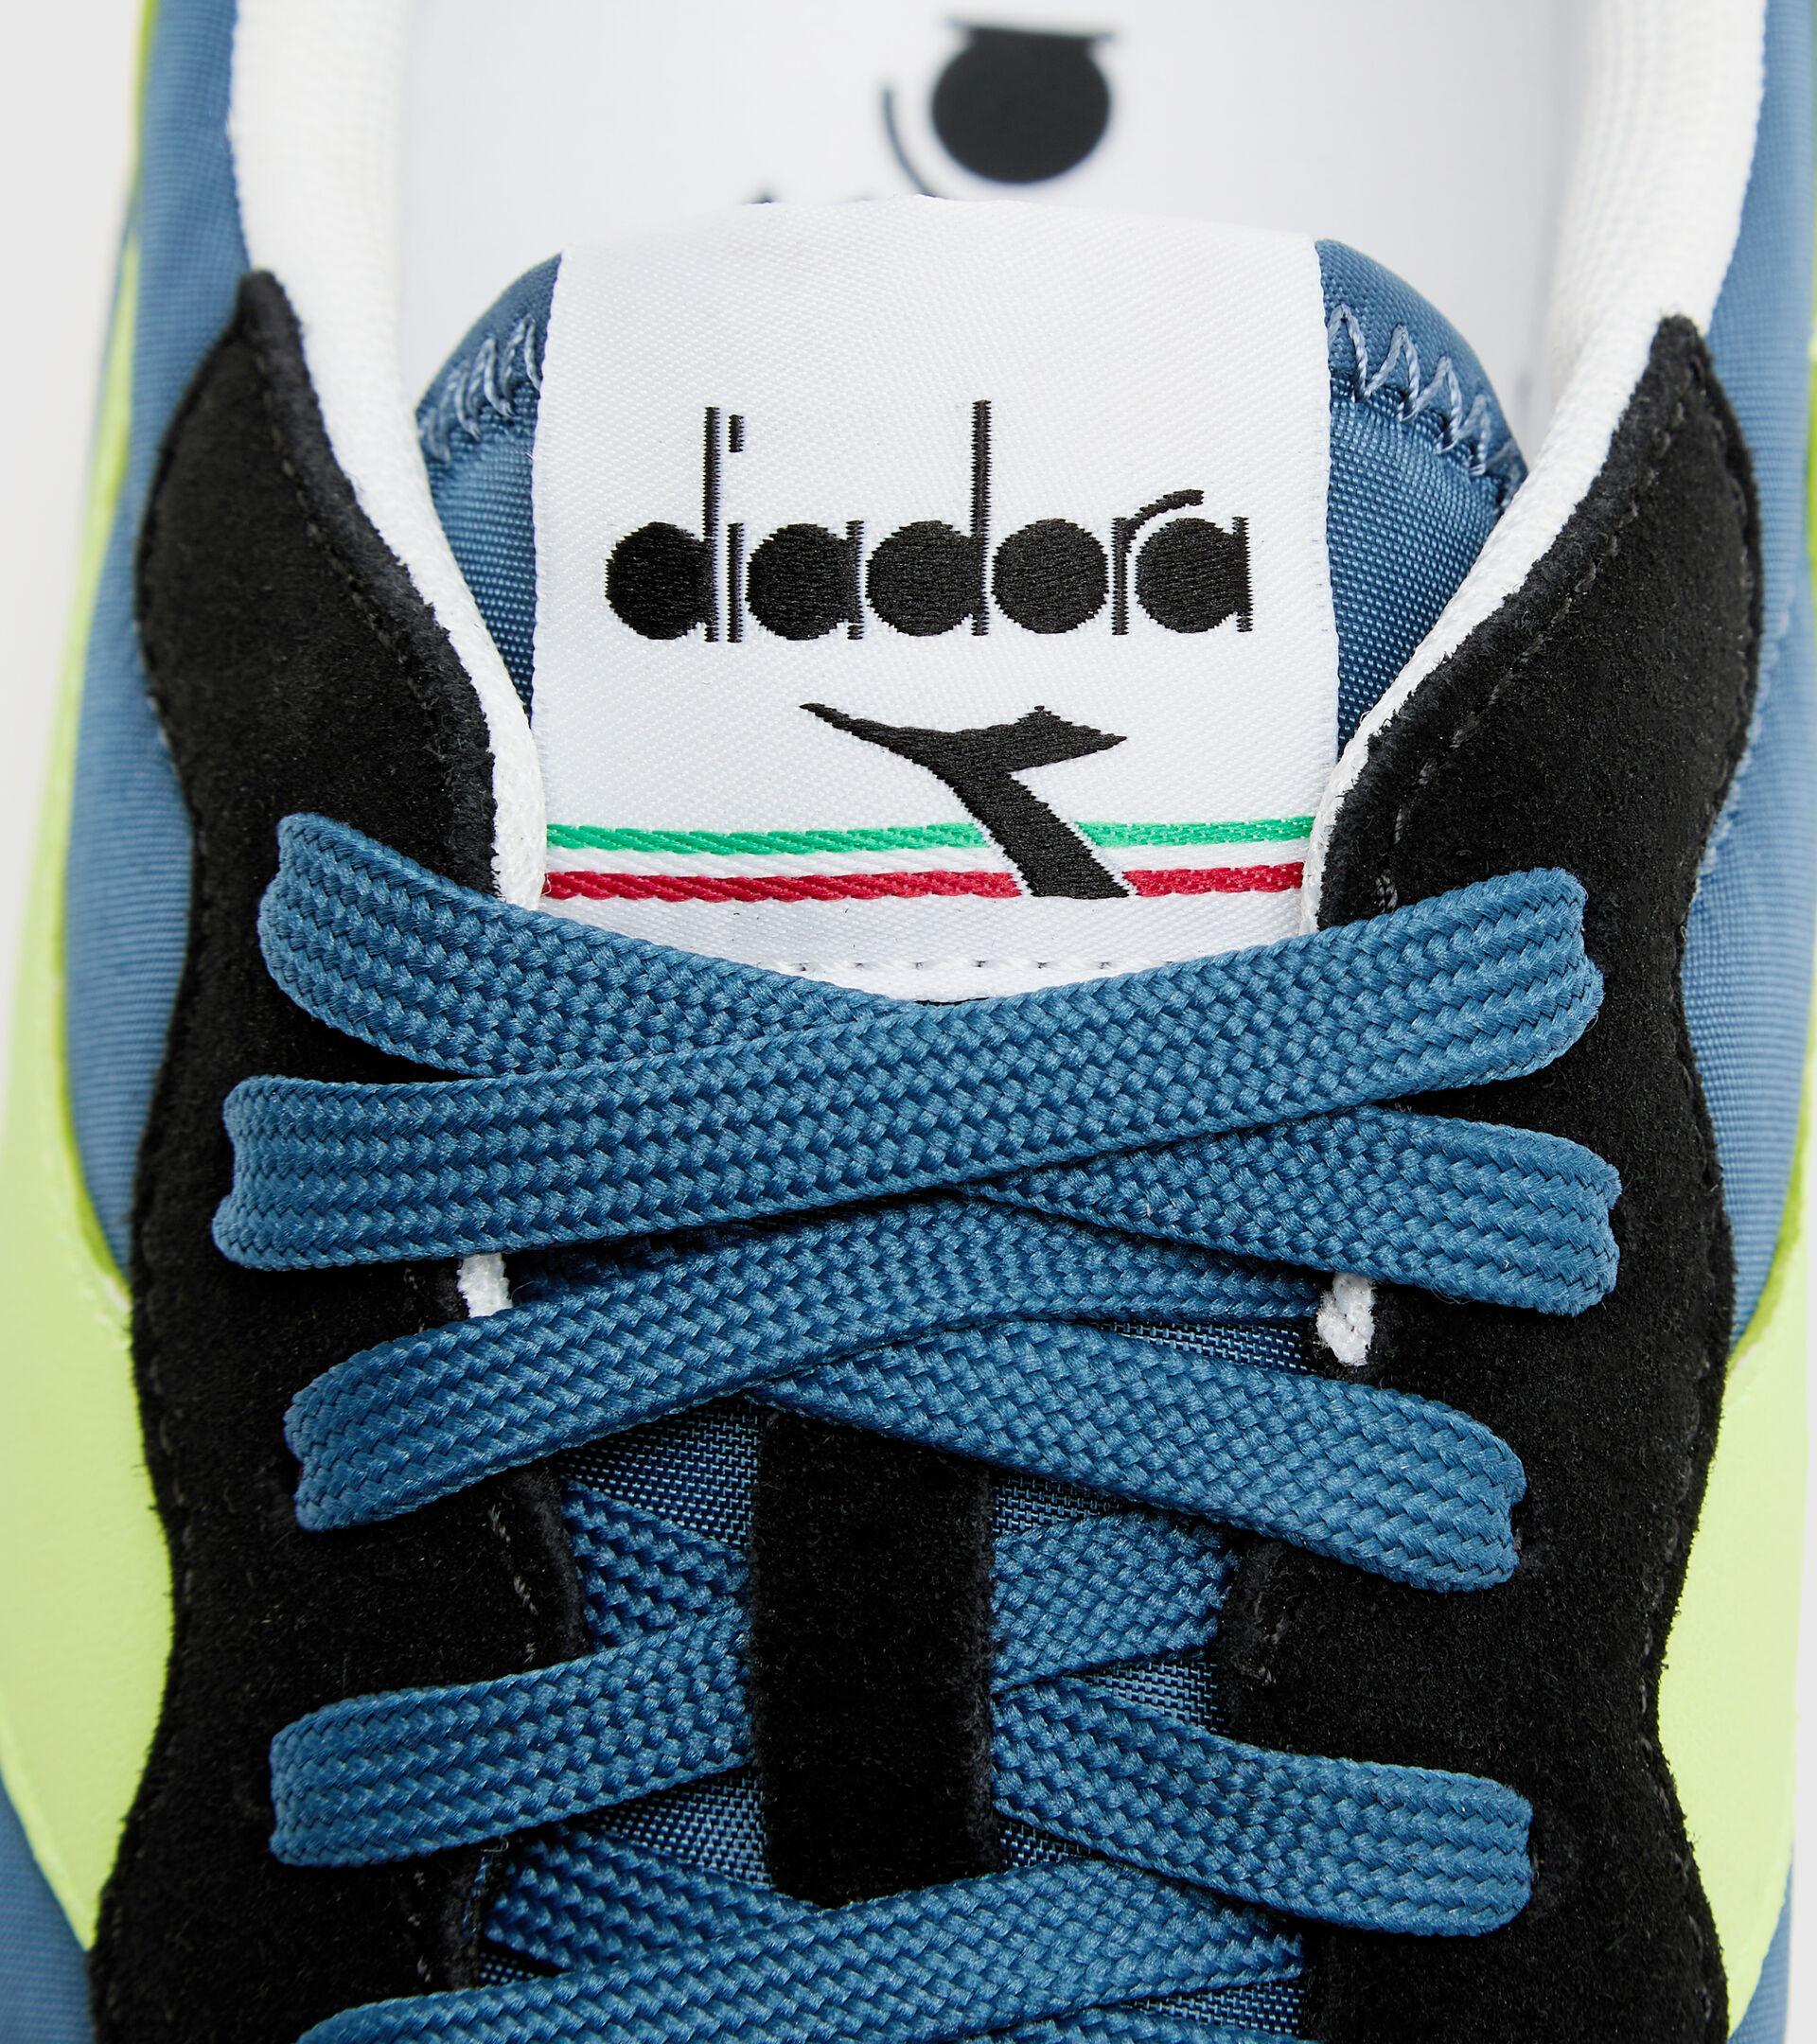 Zapatilla deportiva - Unisex CAMARO MEDIONOCHE/NEGRO - Diadora